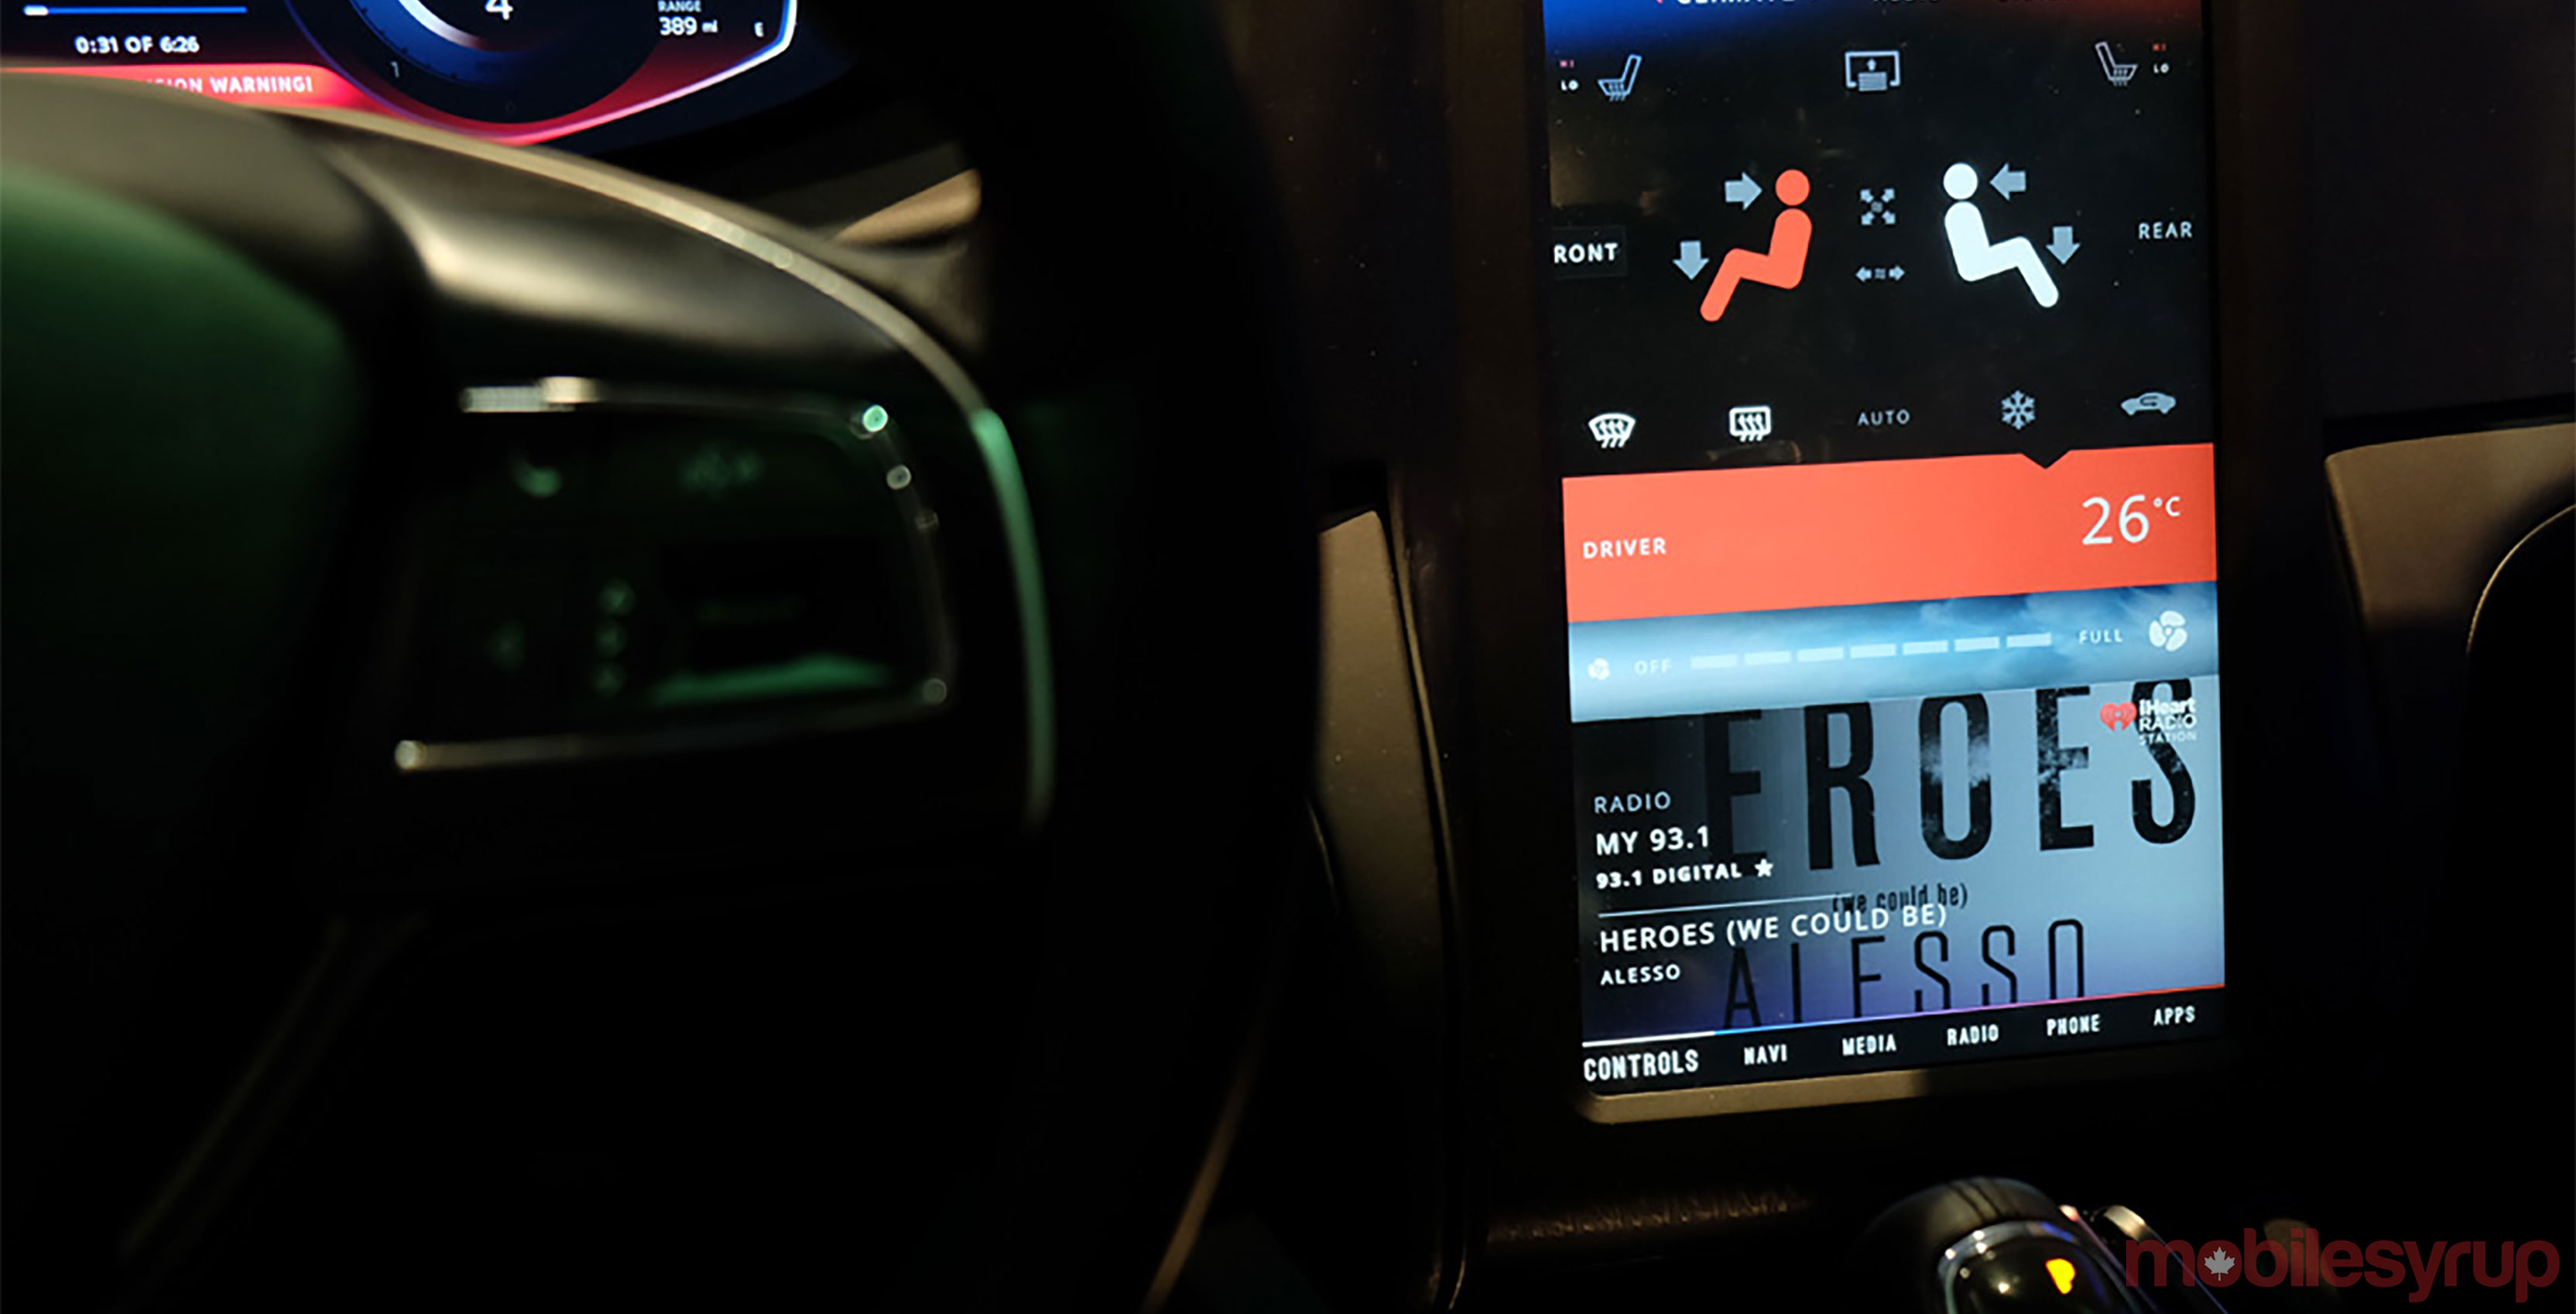 BlackBerry in-car